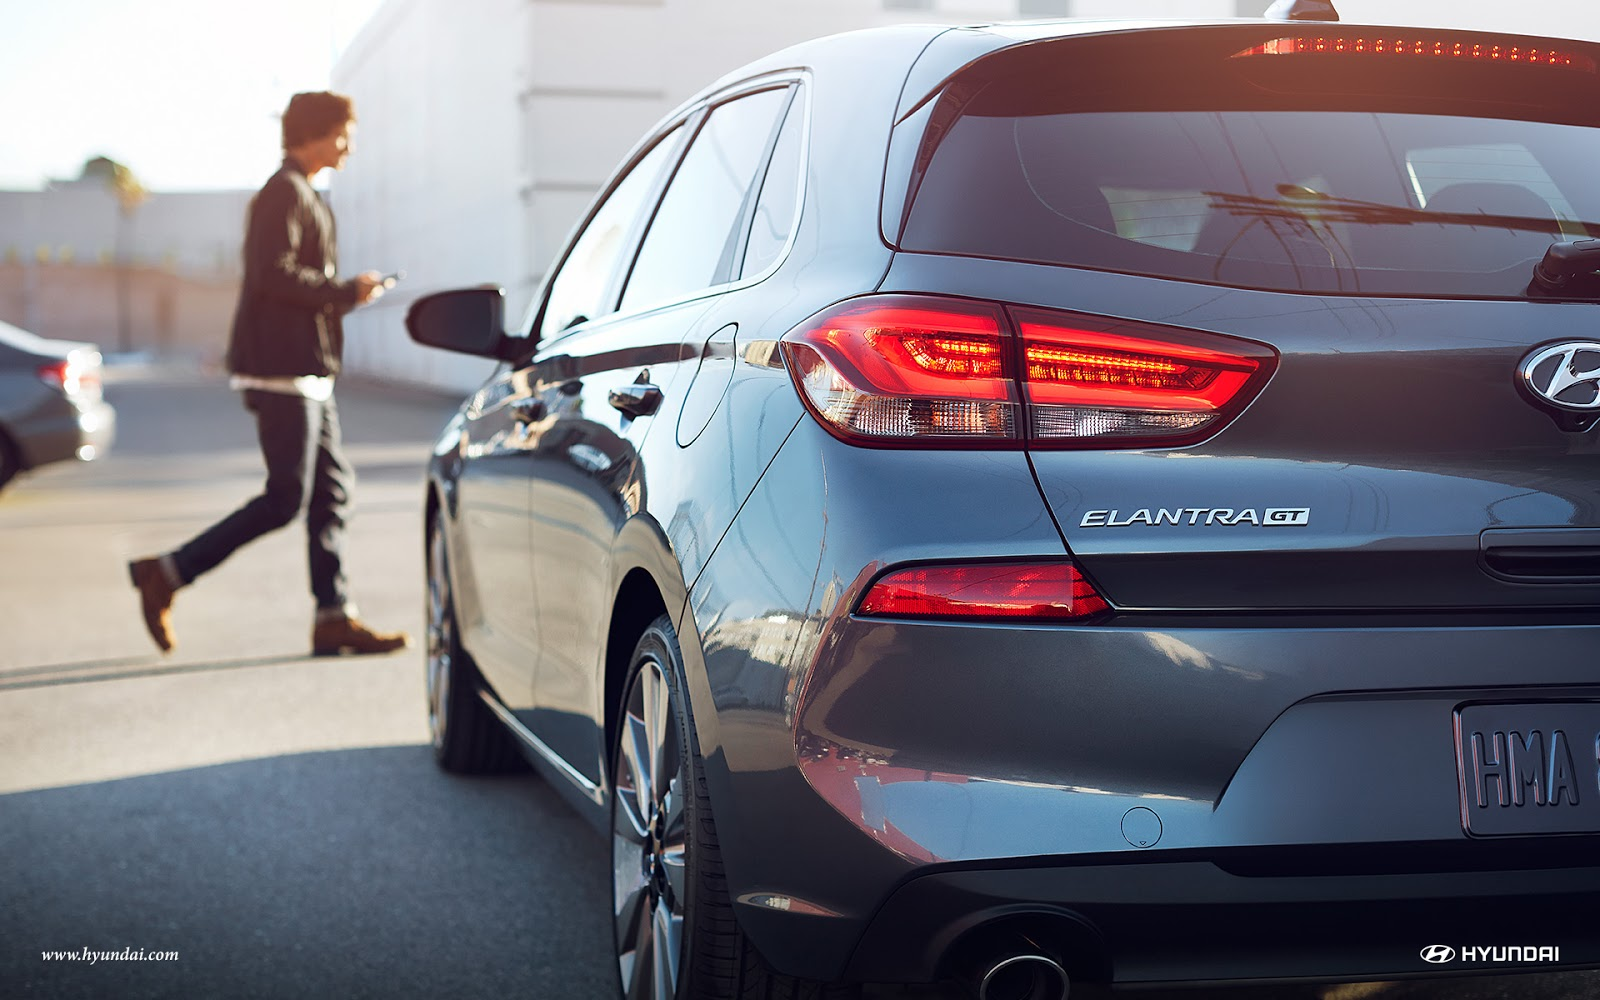 Hyundai Elantra mới